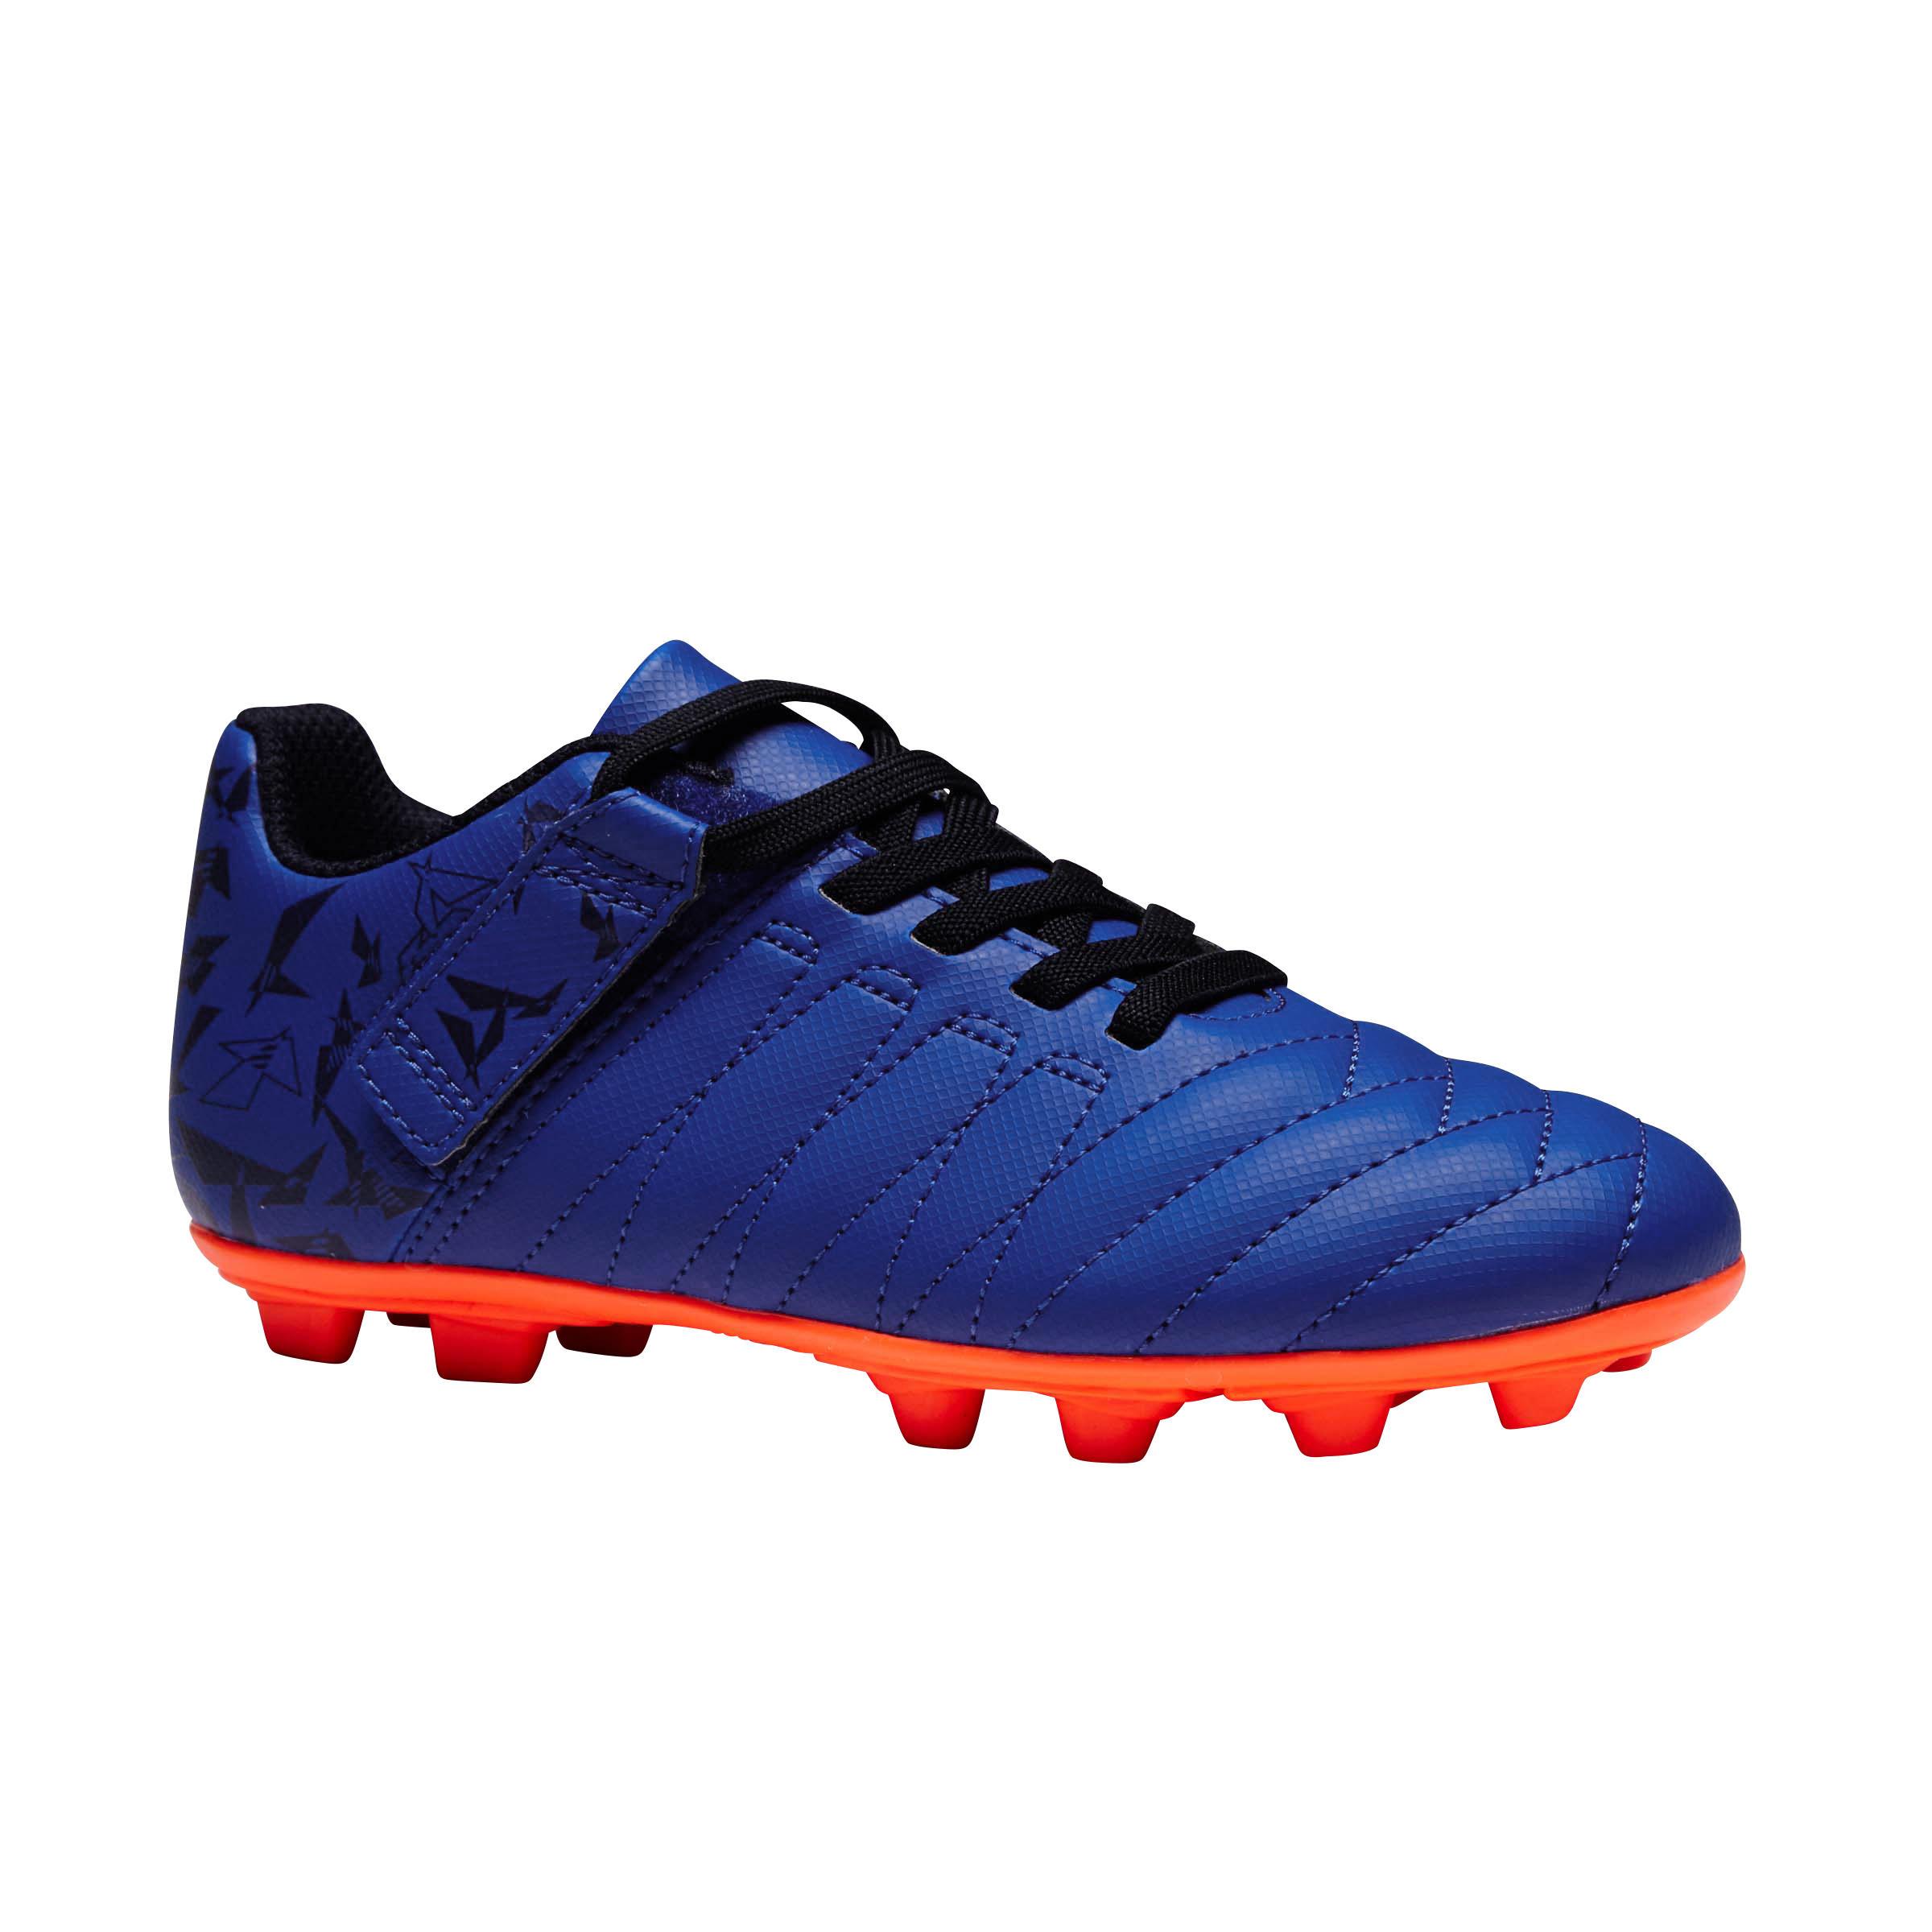 Kipsta Voetbalschoenen kind Agility 300 FG klittenband blauw/oranje